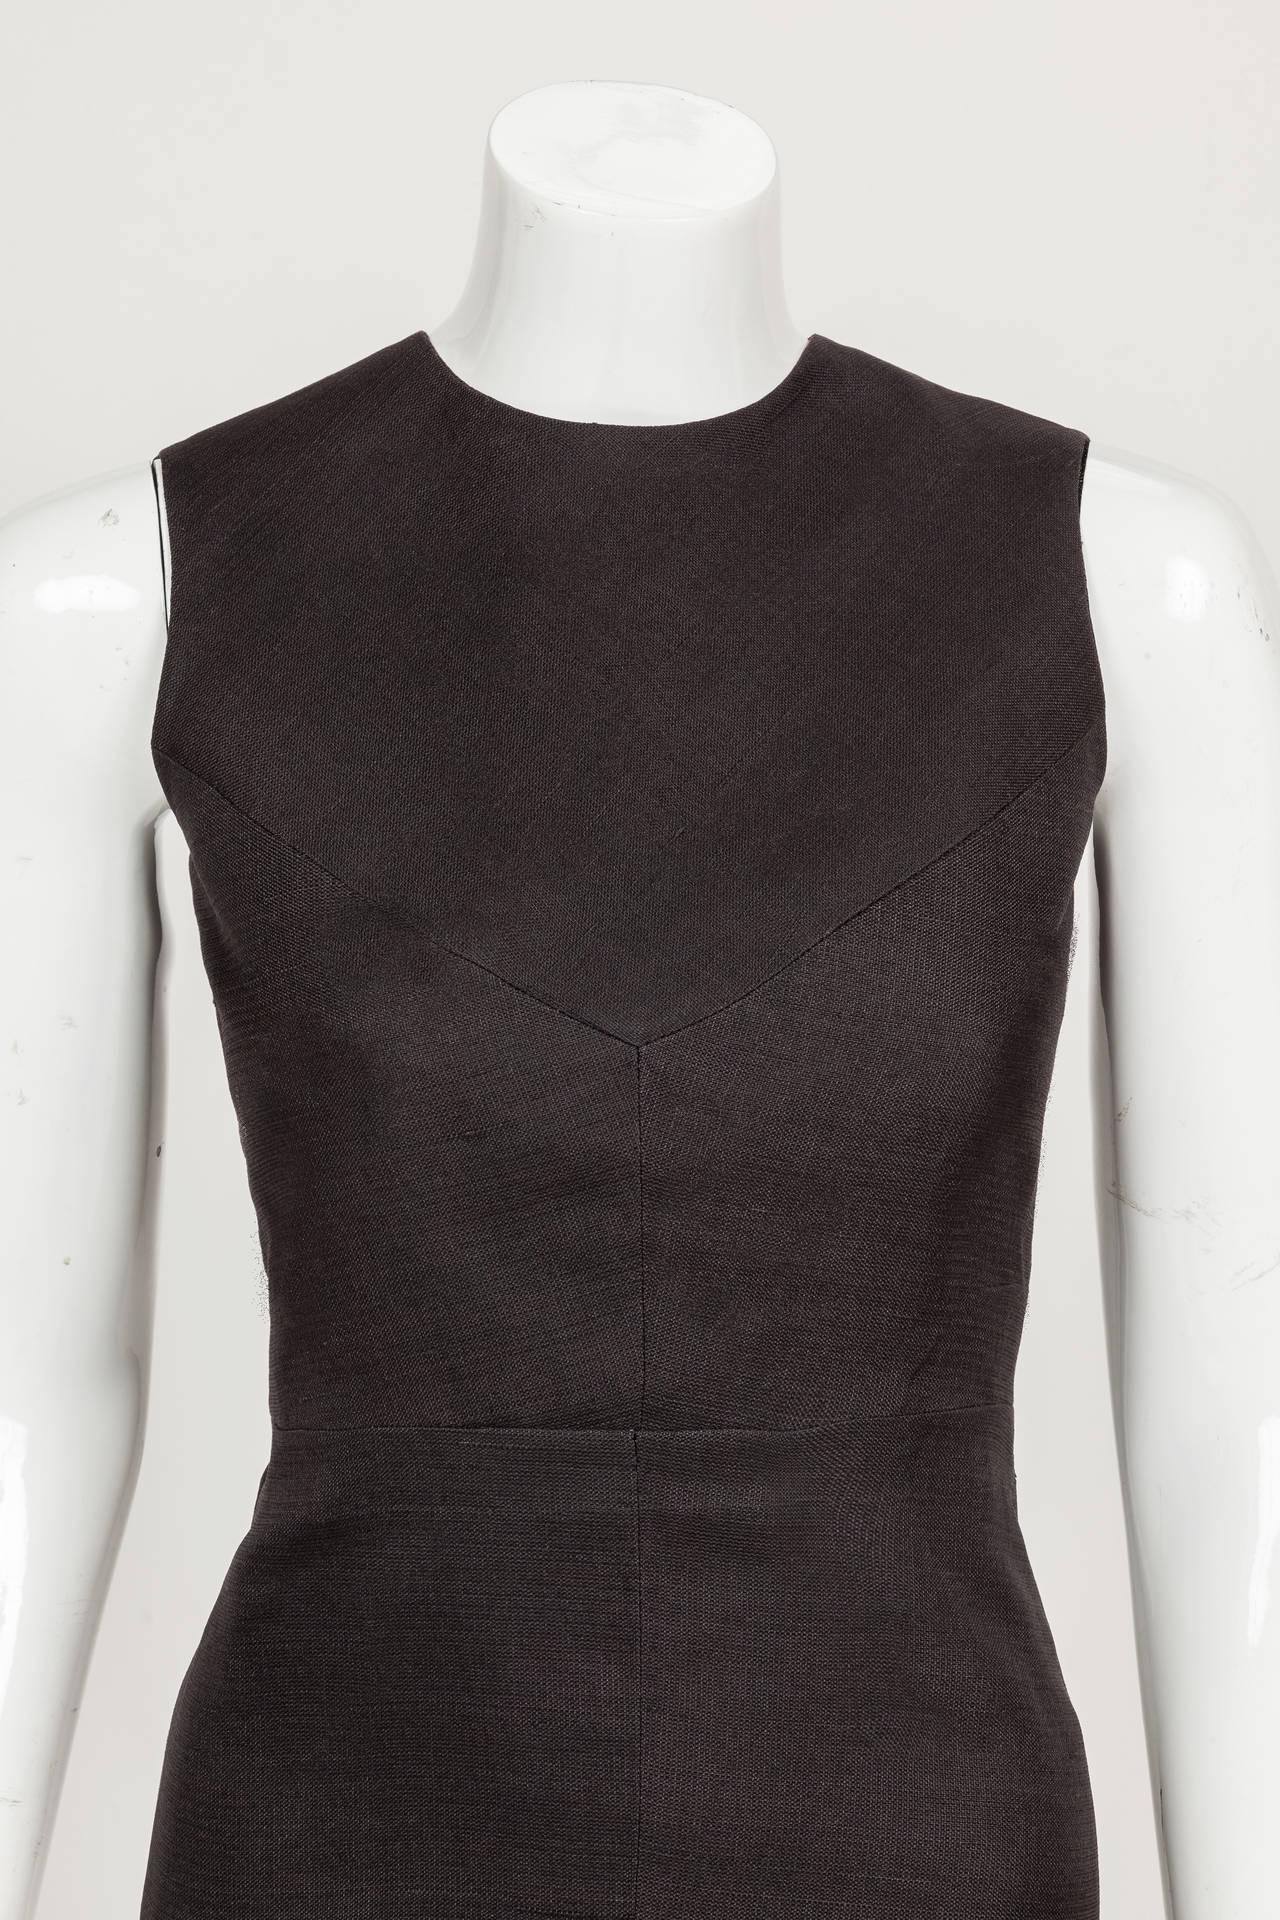 1974 Pierre Balmain Haute Couture Runway Cocktail Dress No. 57179 3